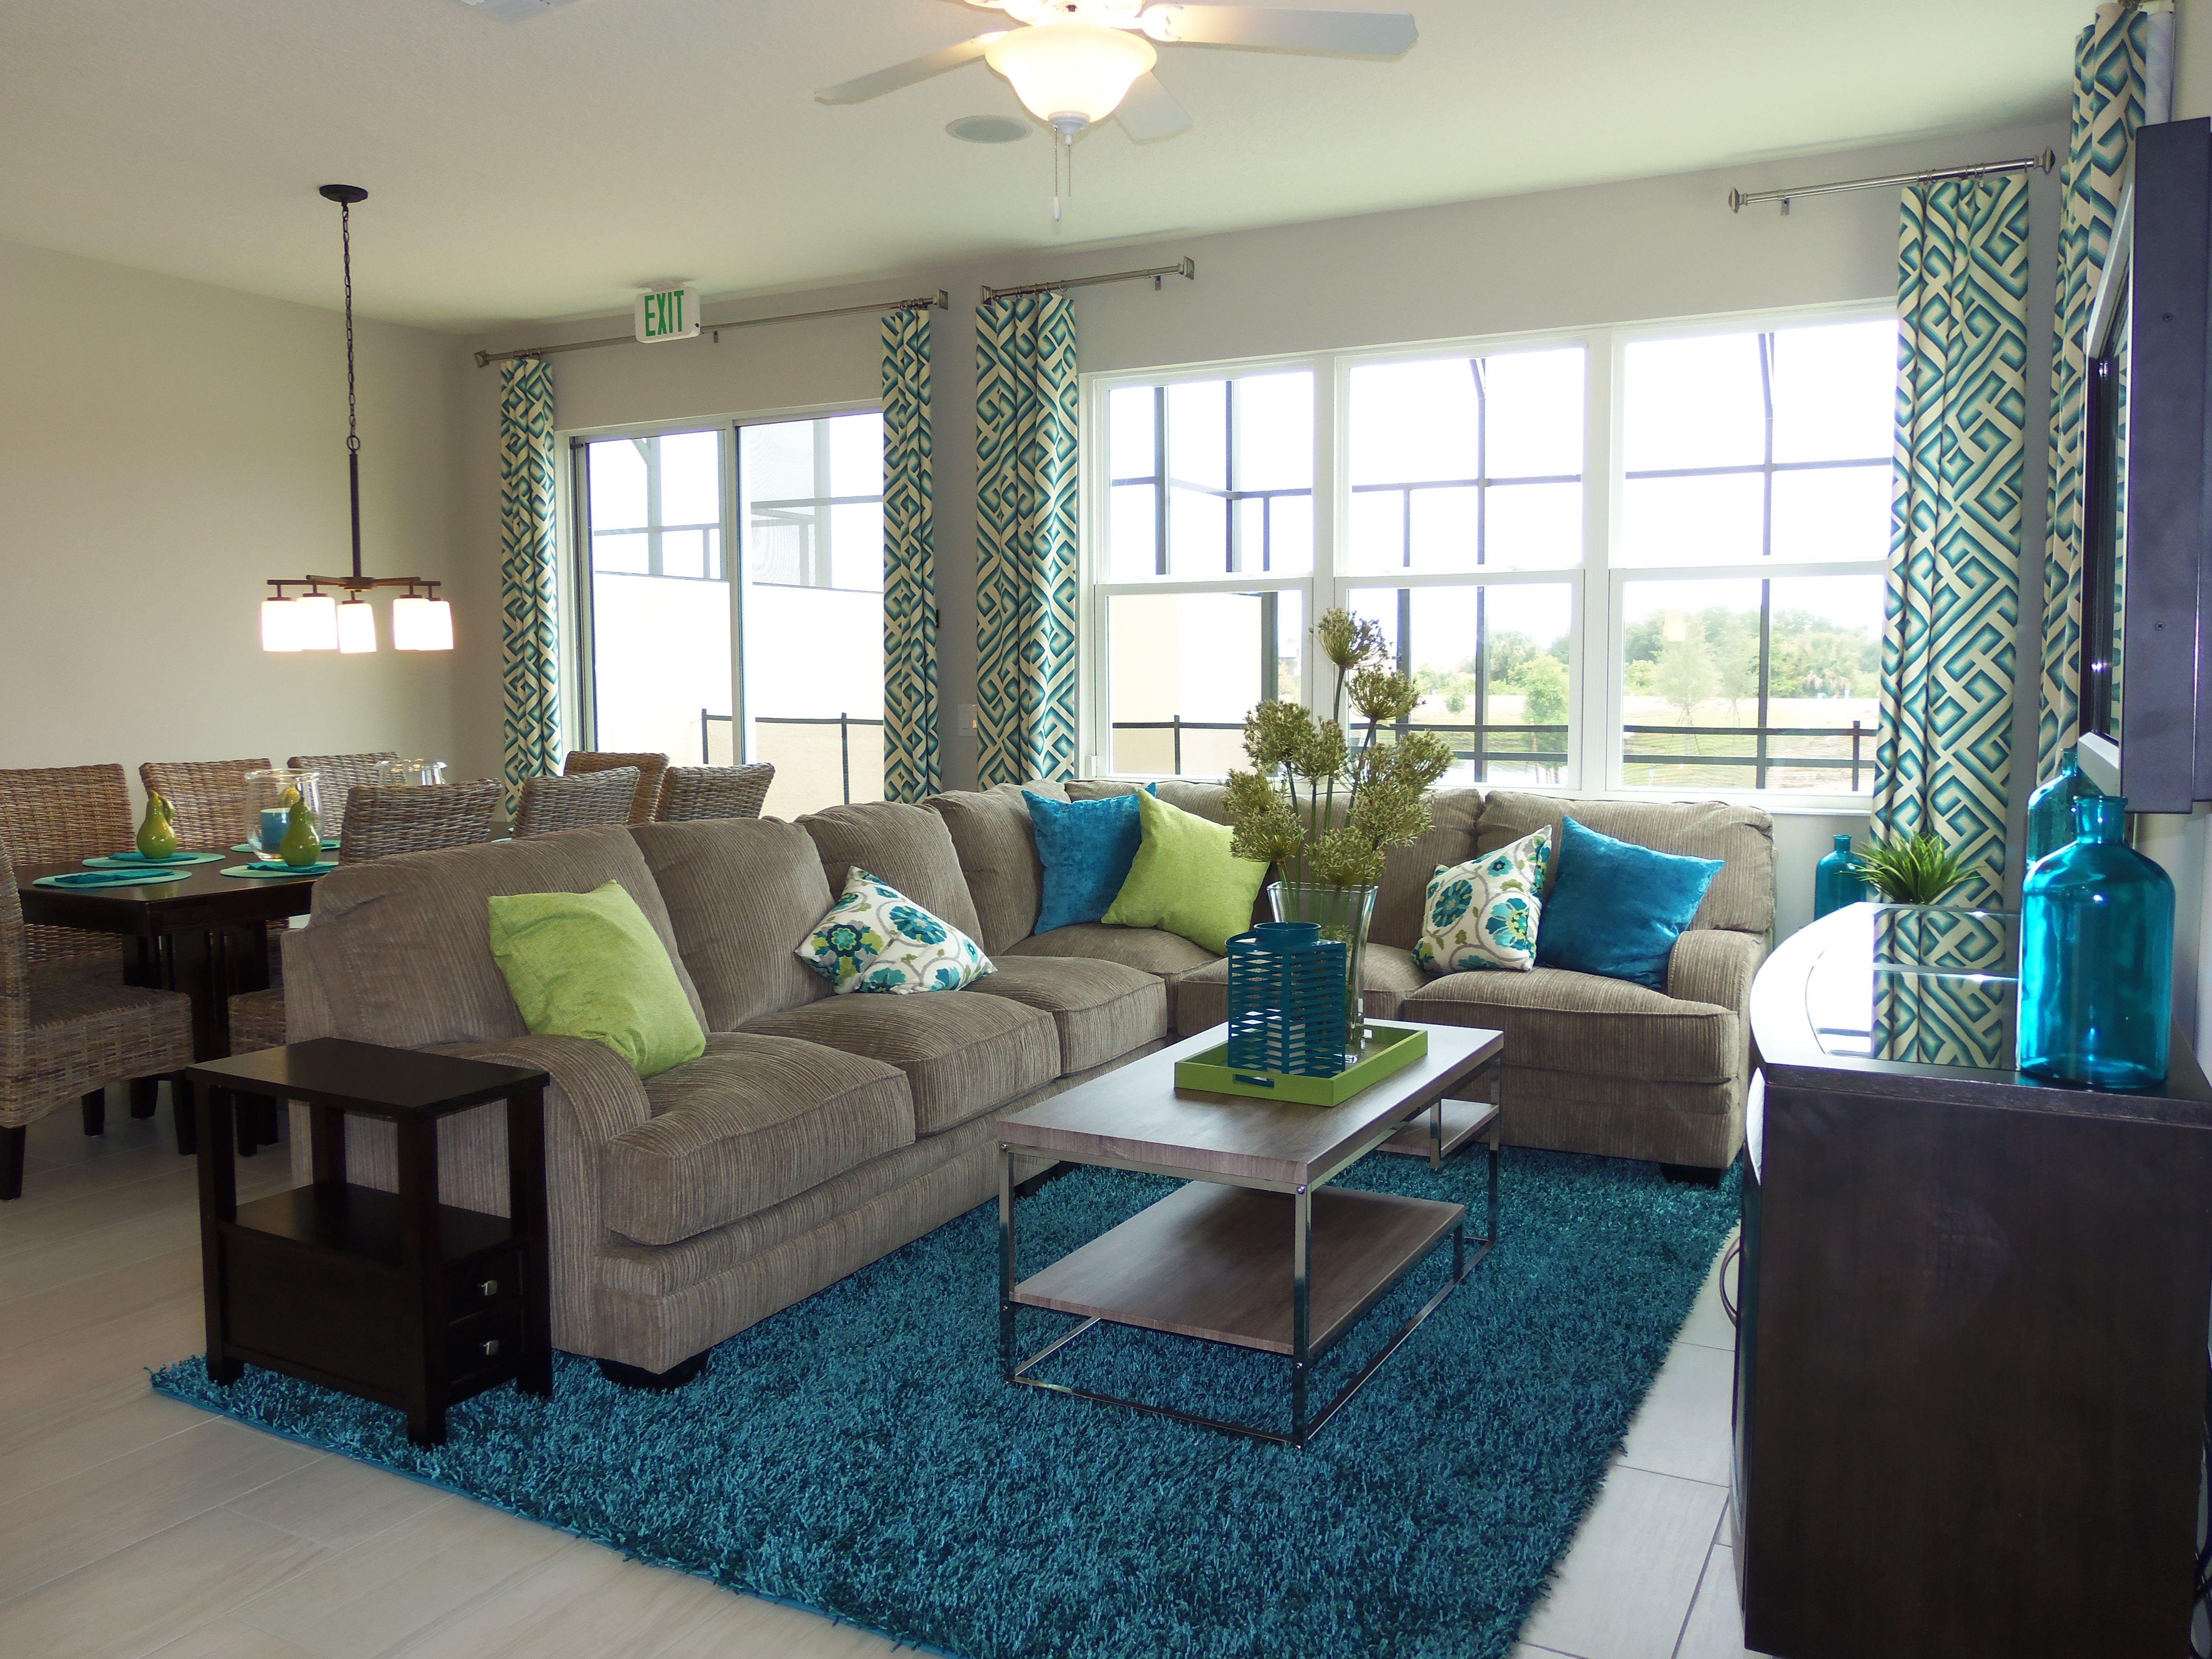 Colorful décor ideas for vacation home décor. Home decor